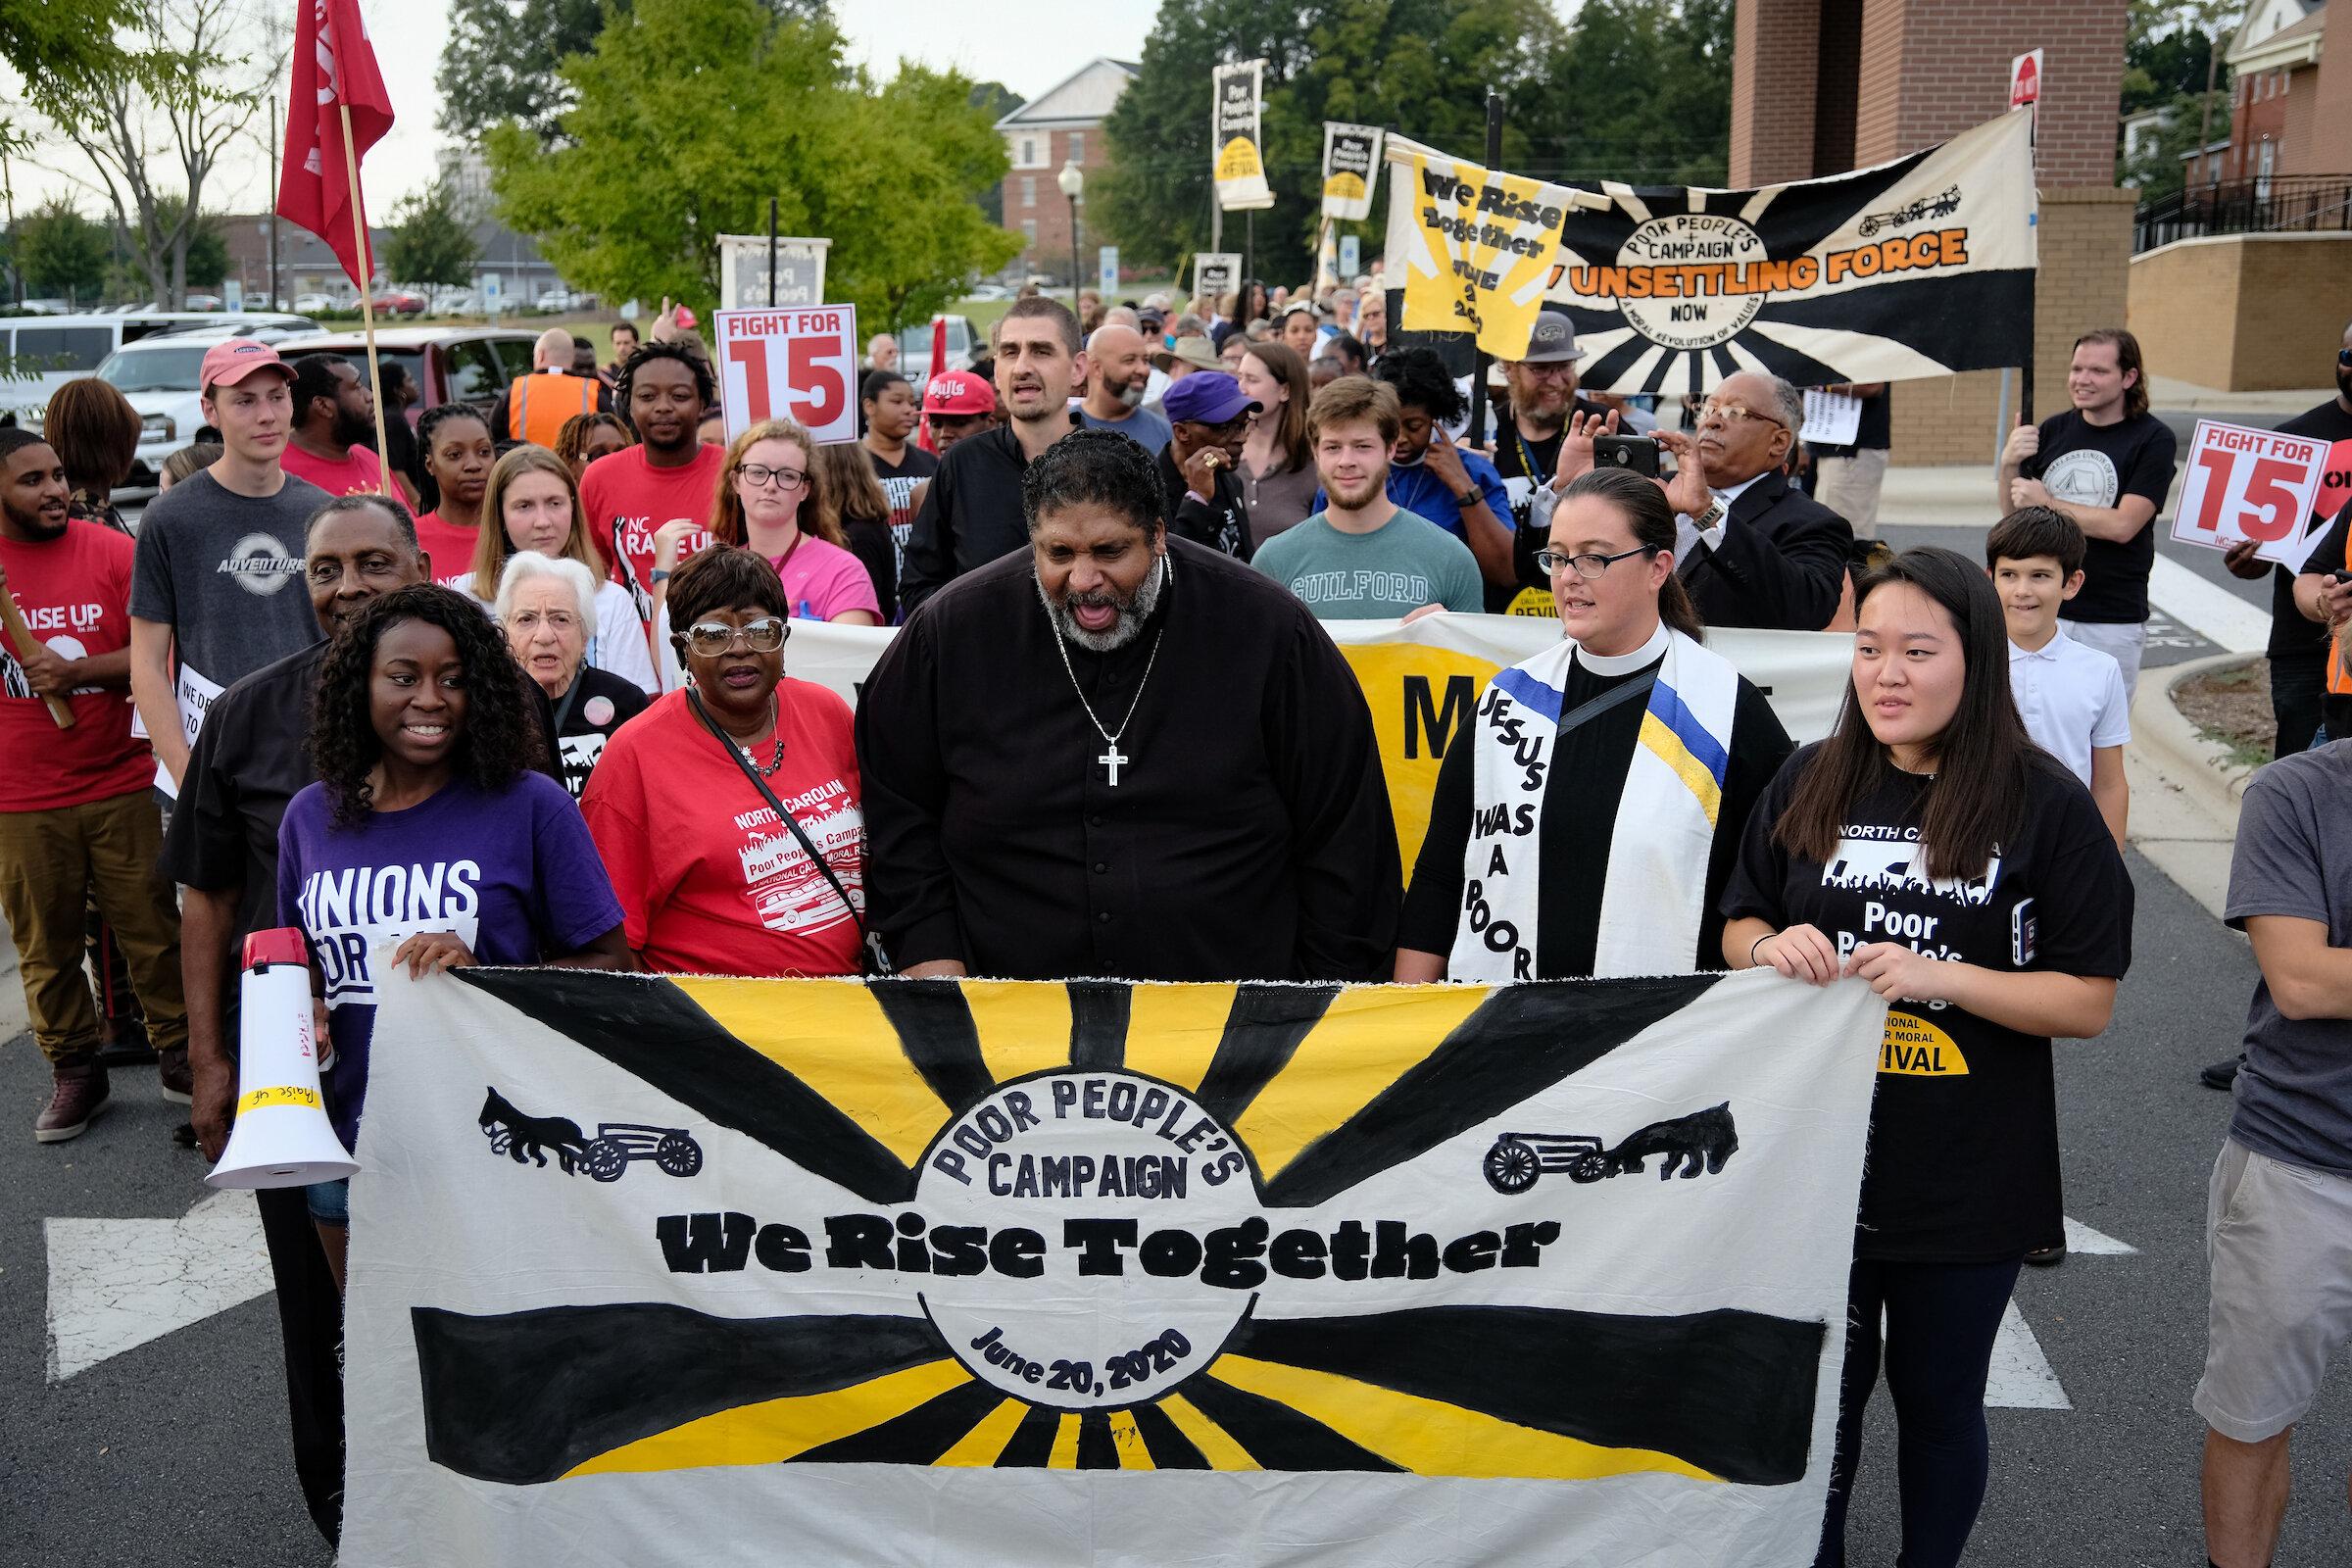 2019 0930 NC Greensboro MORE march by Steve Pavey HopeinFocus-42.jpg